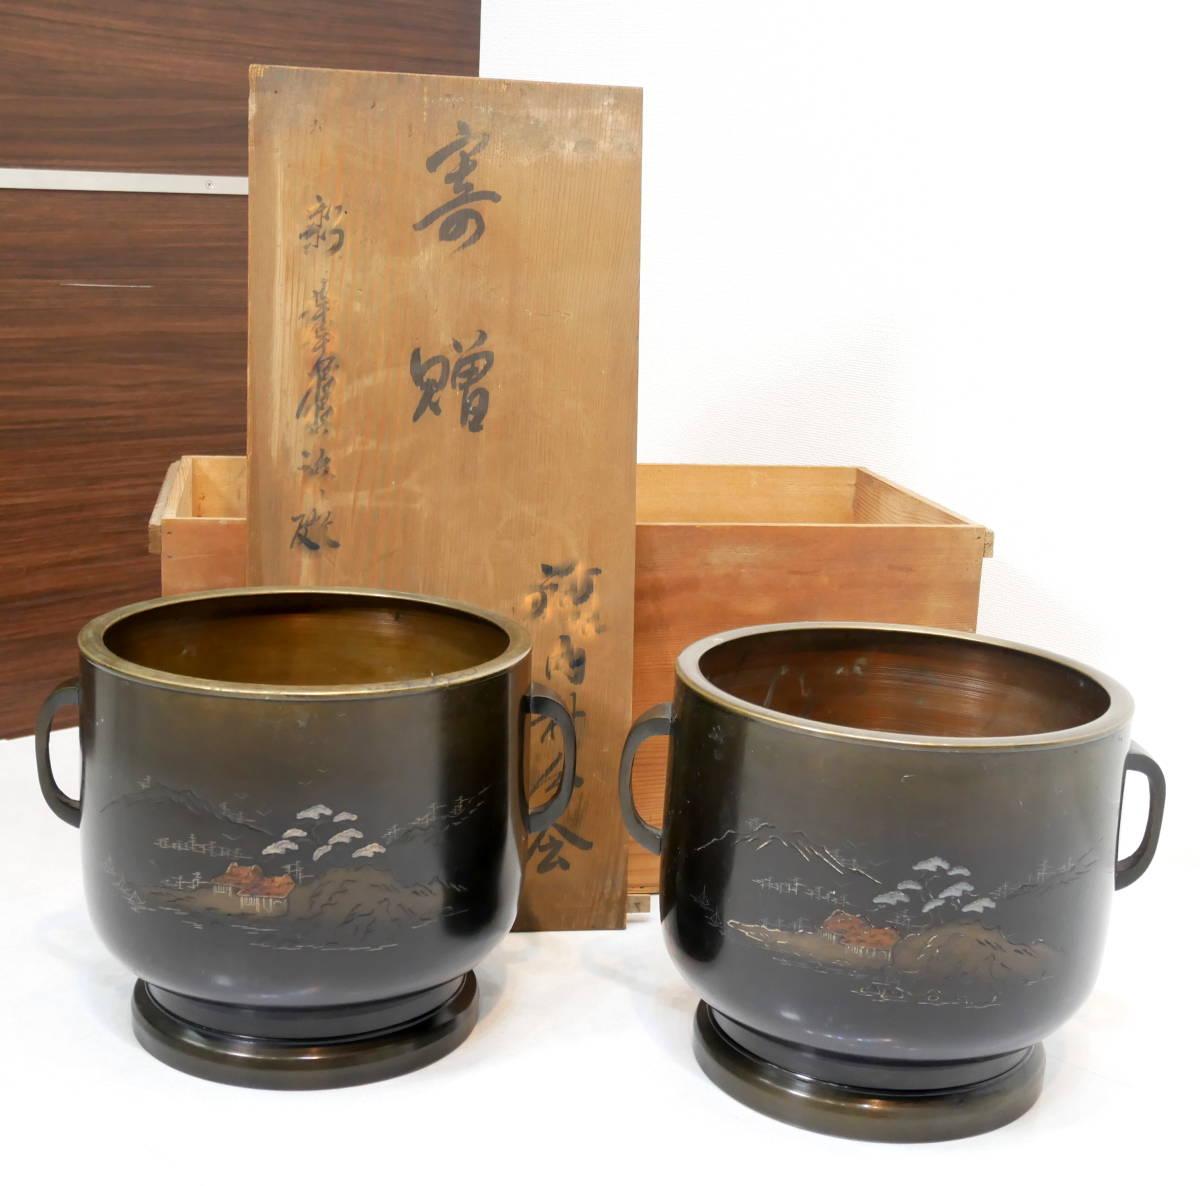 ▲(R205-B121)時代物 銅火鉢 真鍮 黄銅 共箱付き 直径26cm 高さ24cm 火ばち 置物 アンティーク 灰付_画像1